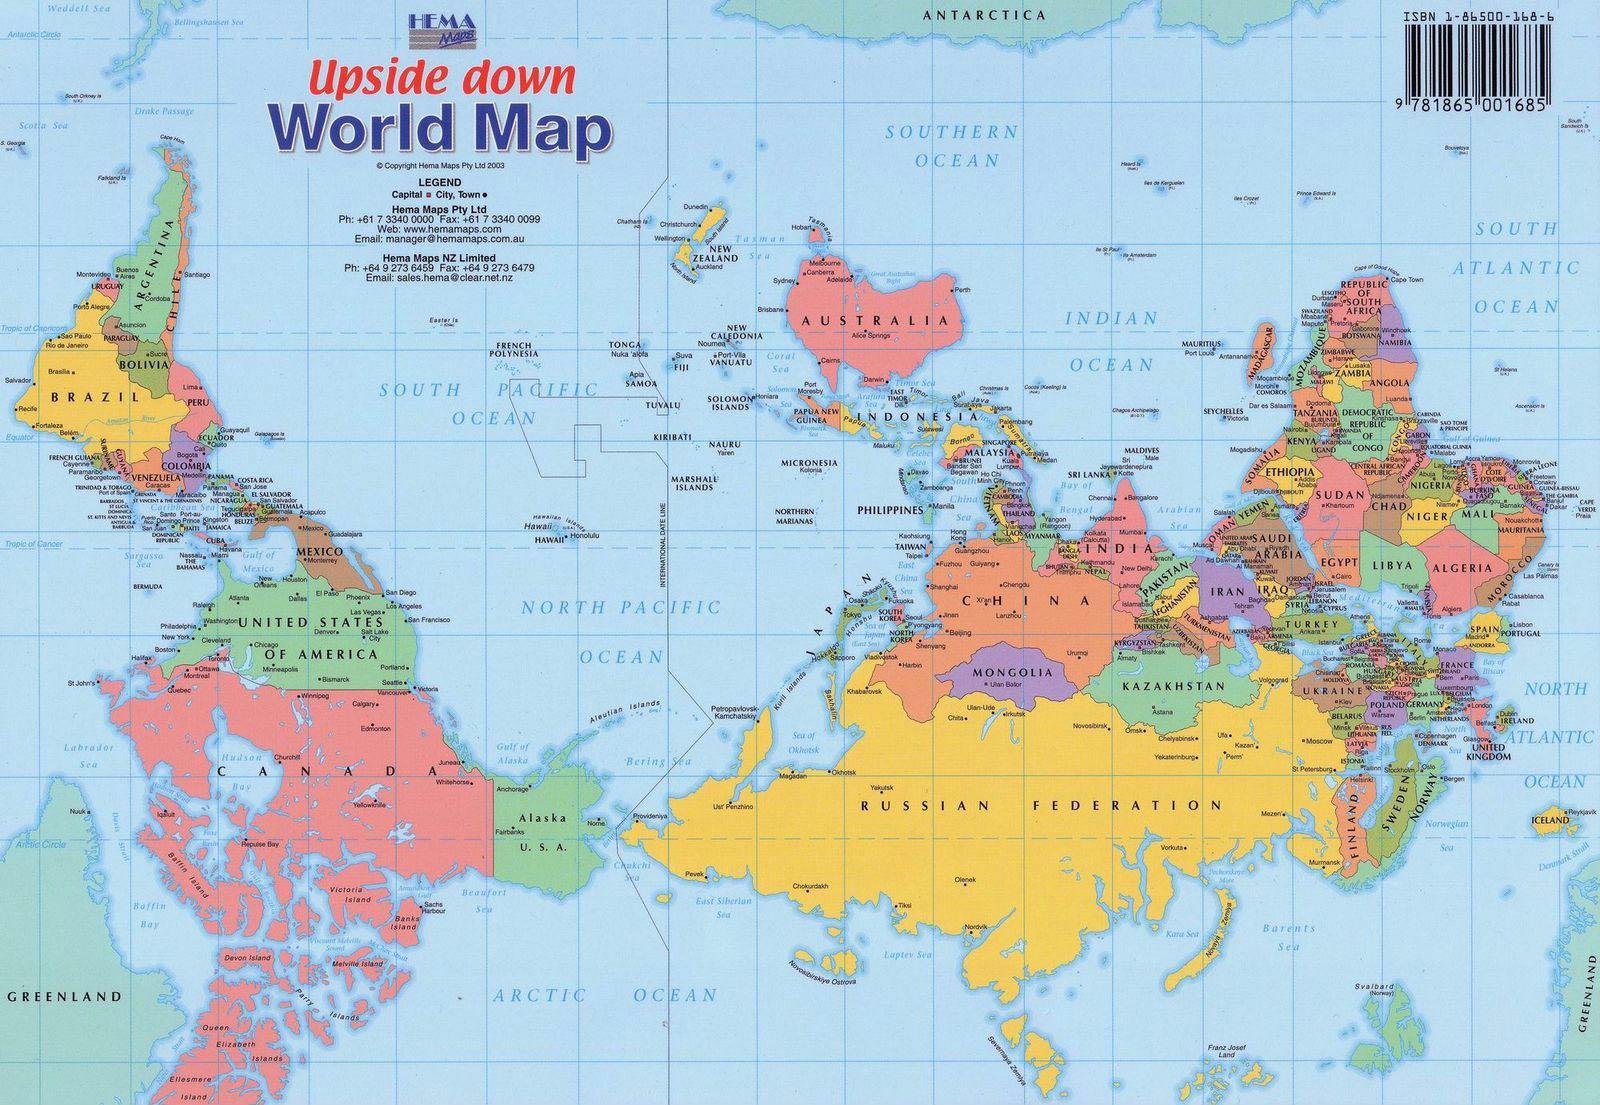 Leobrujuleo el mundo al revs upside down world map as bajo el ttulo the world upside down el mundo al revs australia gira en su mapa el eje vertical 180 grados gumiabroncs Images